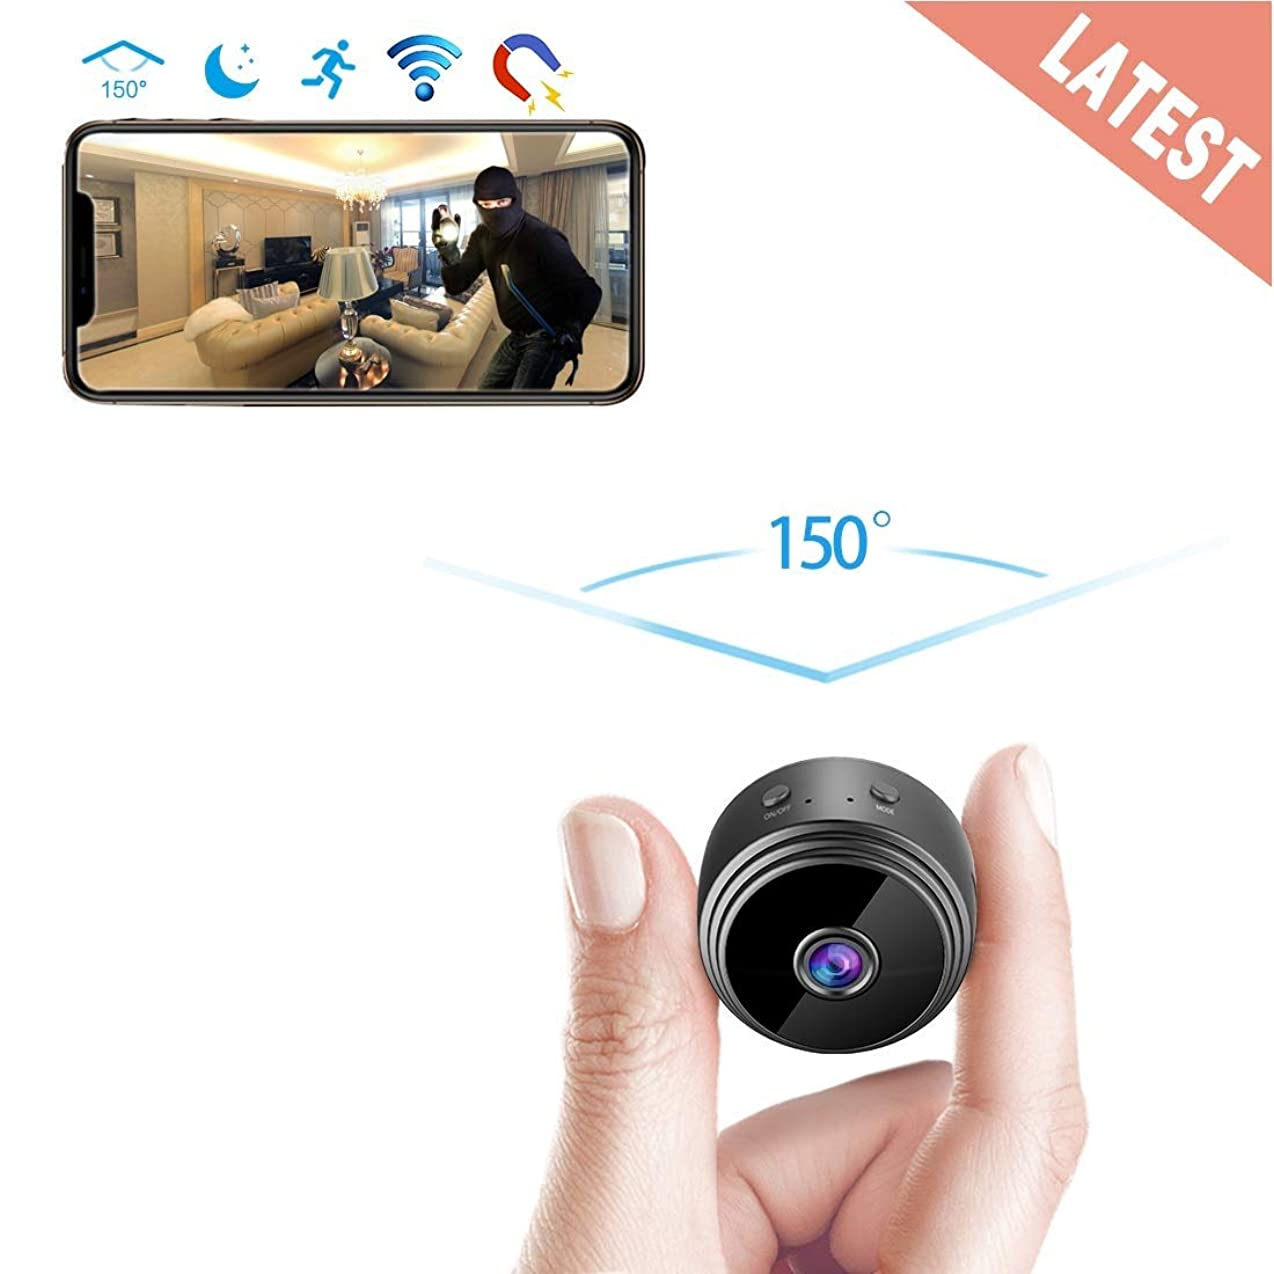 GXSLKWL Spy Camera Wireless Hidden WiFi Camera HD 1080P Mini Camera Covert Nanny Cam Small Indoor Video Recorder Motion Activated/Night Vision Portable Home Security Cameras vixbttibbguj6382